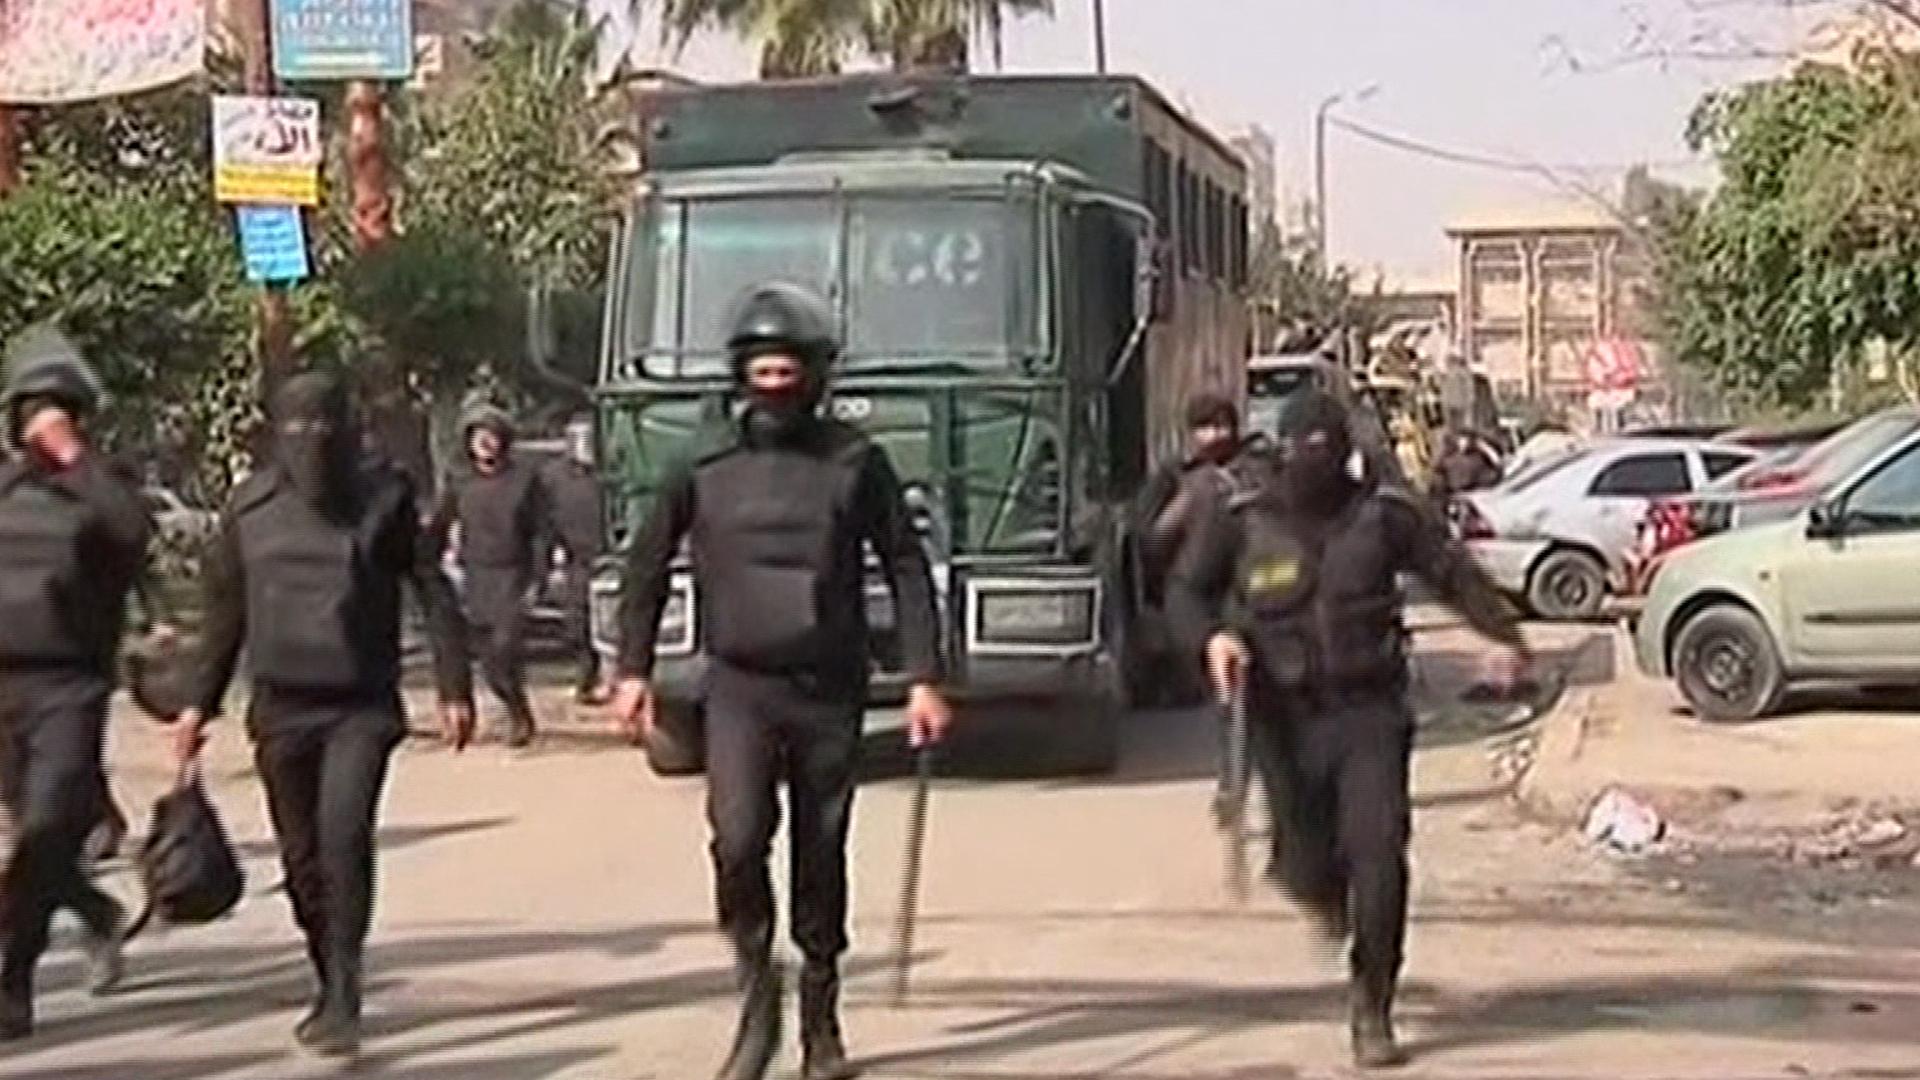 Violent clashes in Egypt on Jan. 25 anniv.